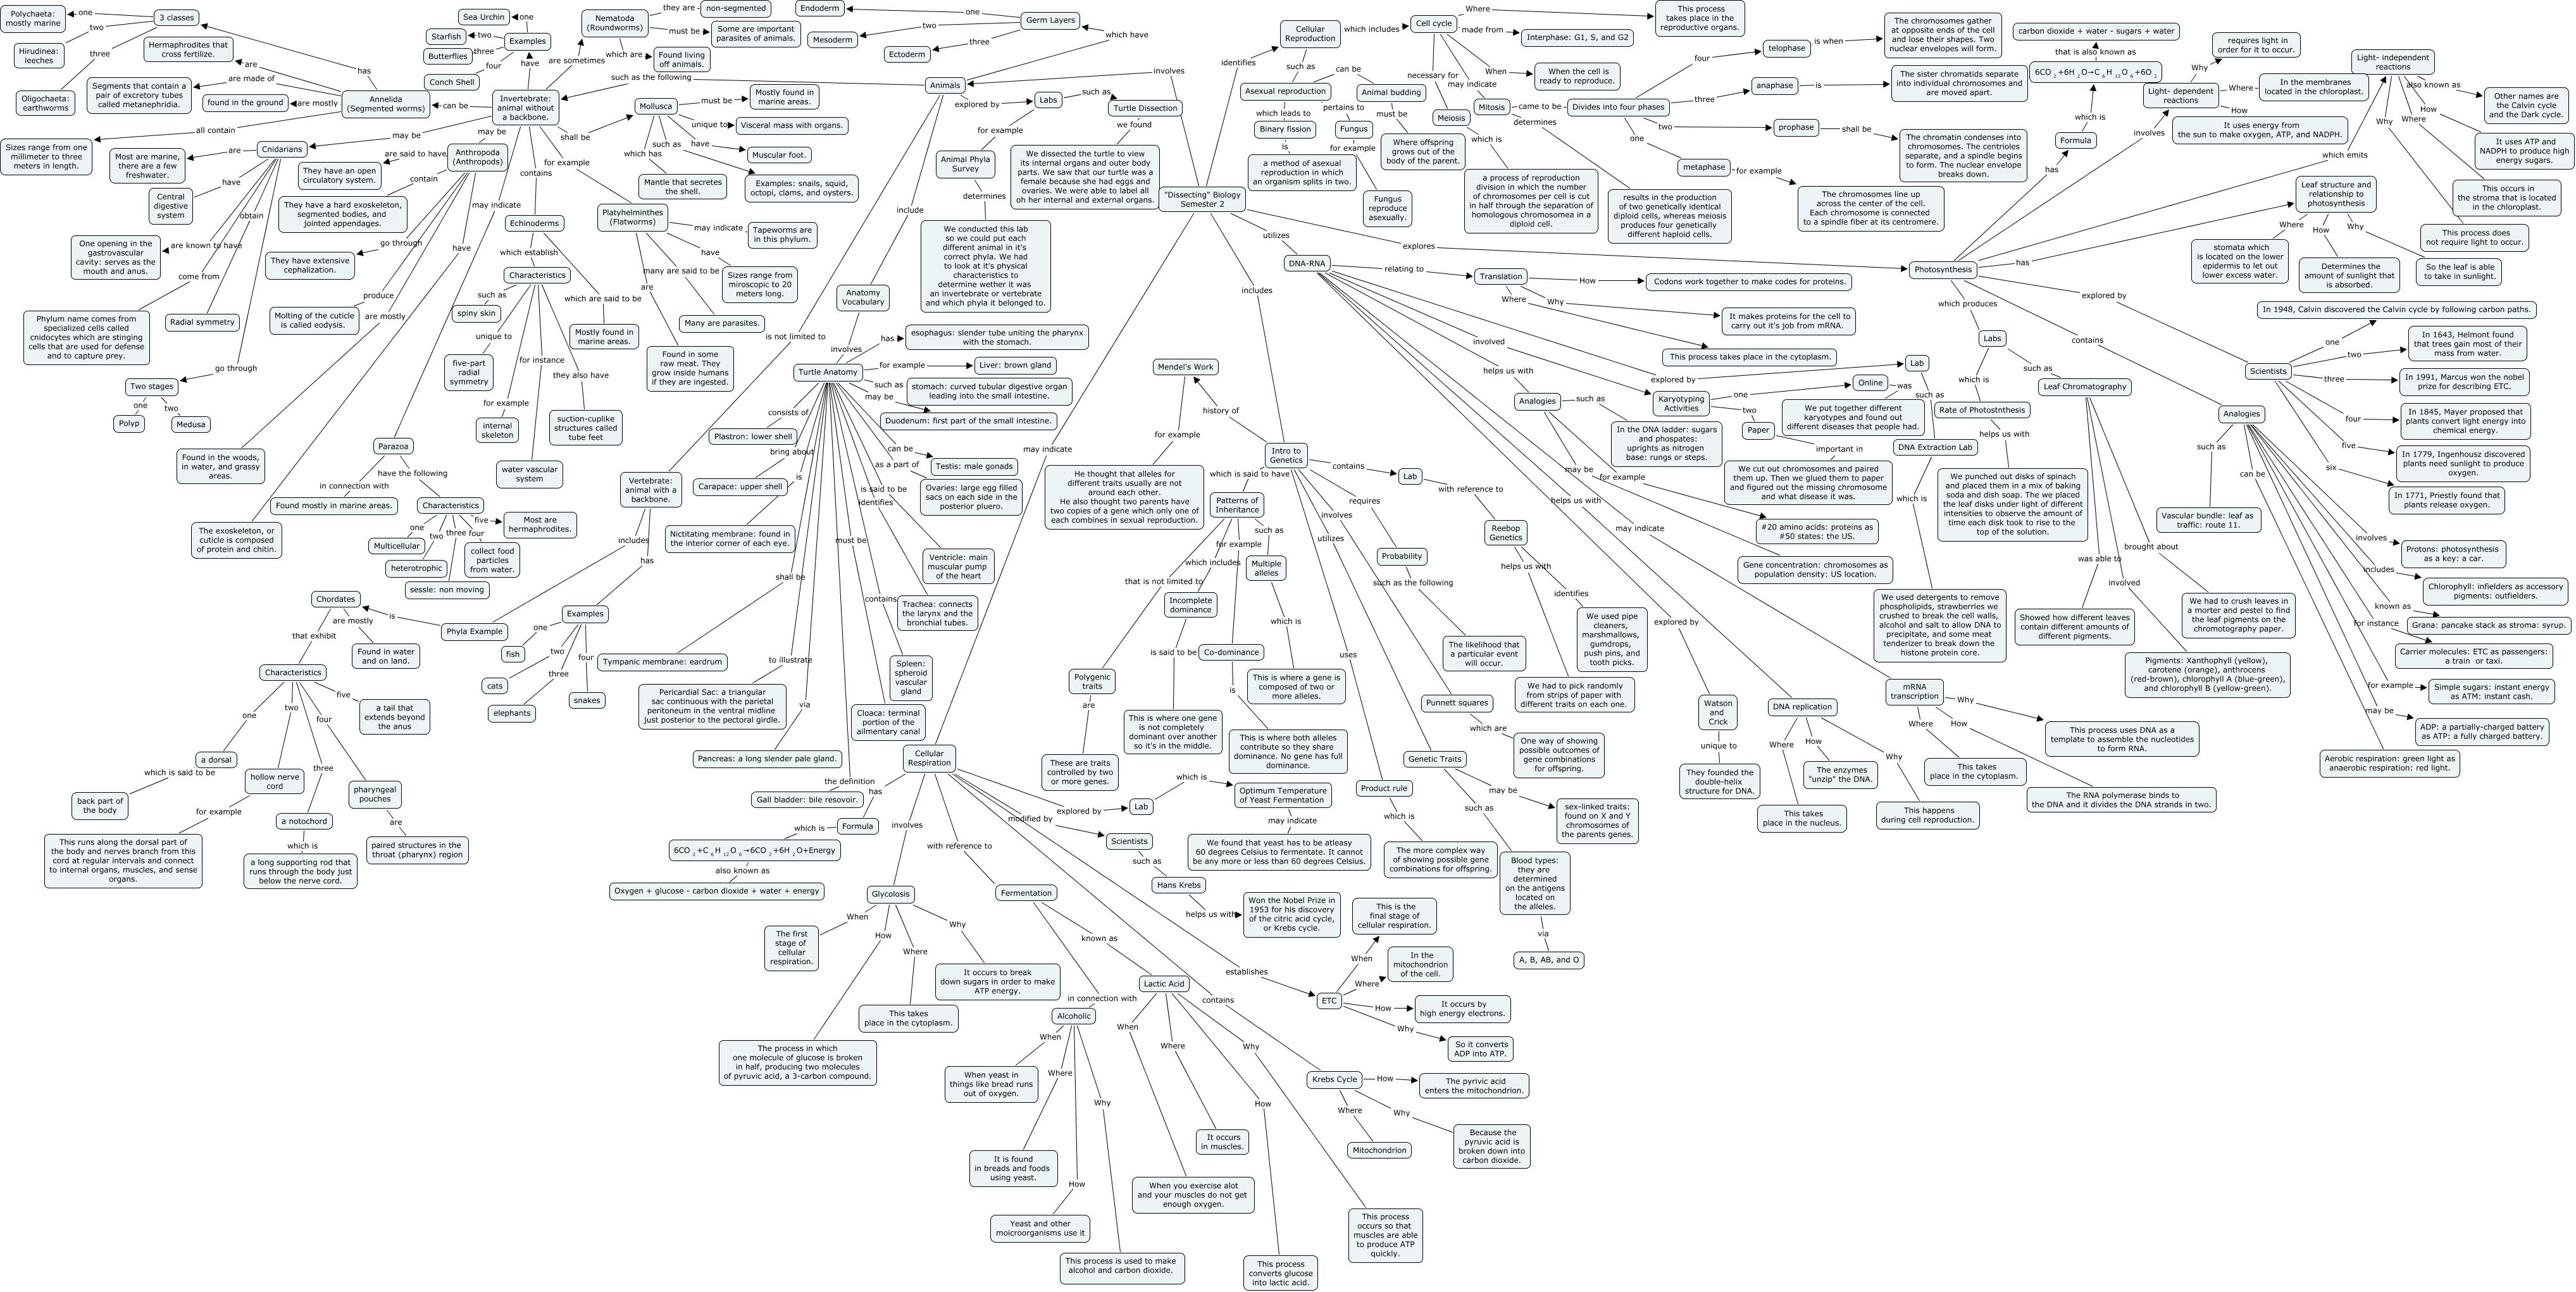 Danielle Duffy Semester 2 concept map